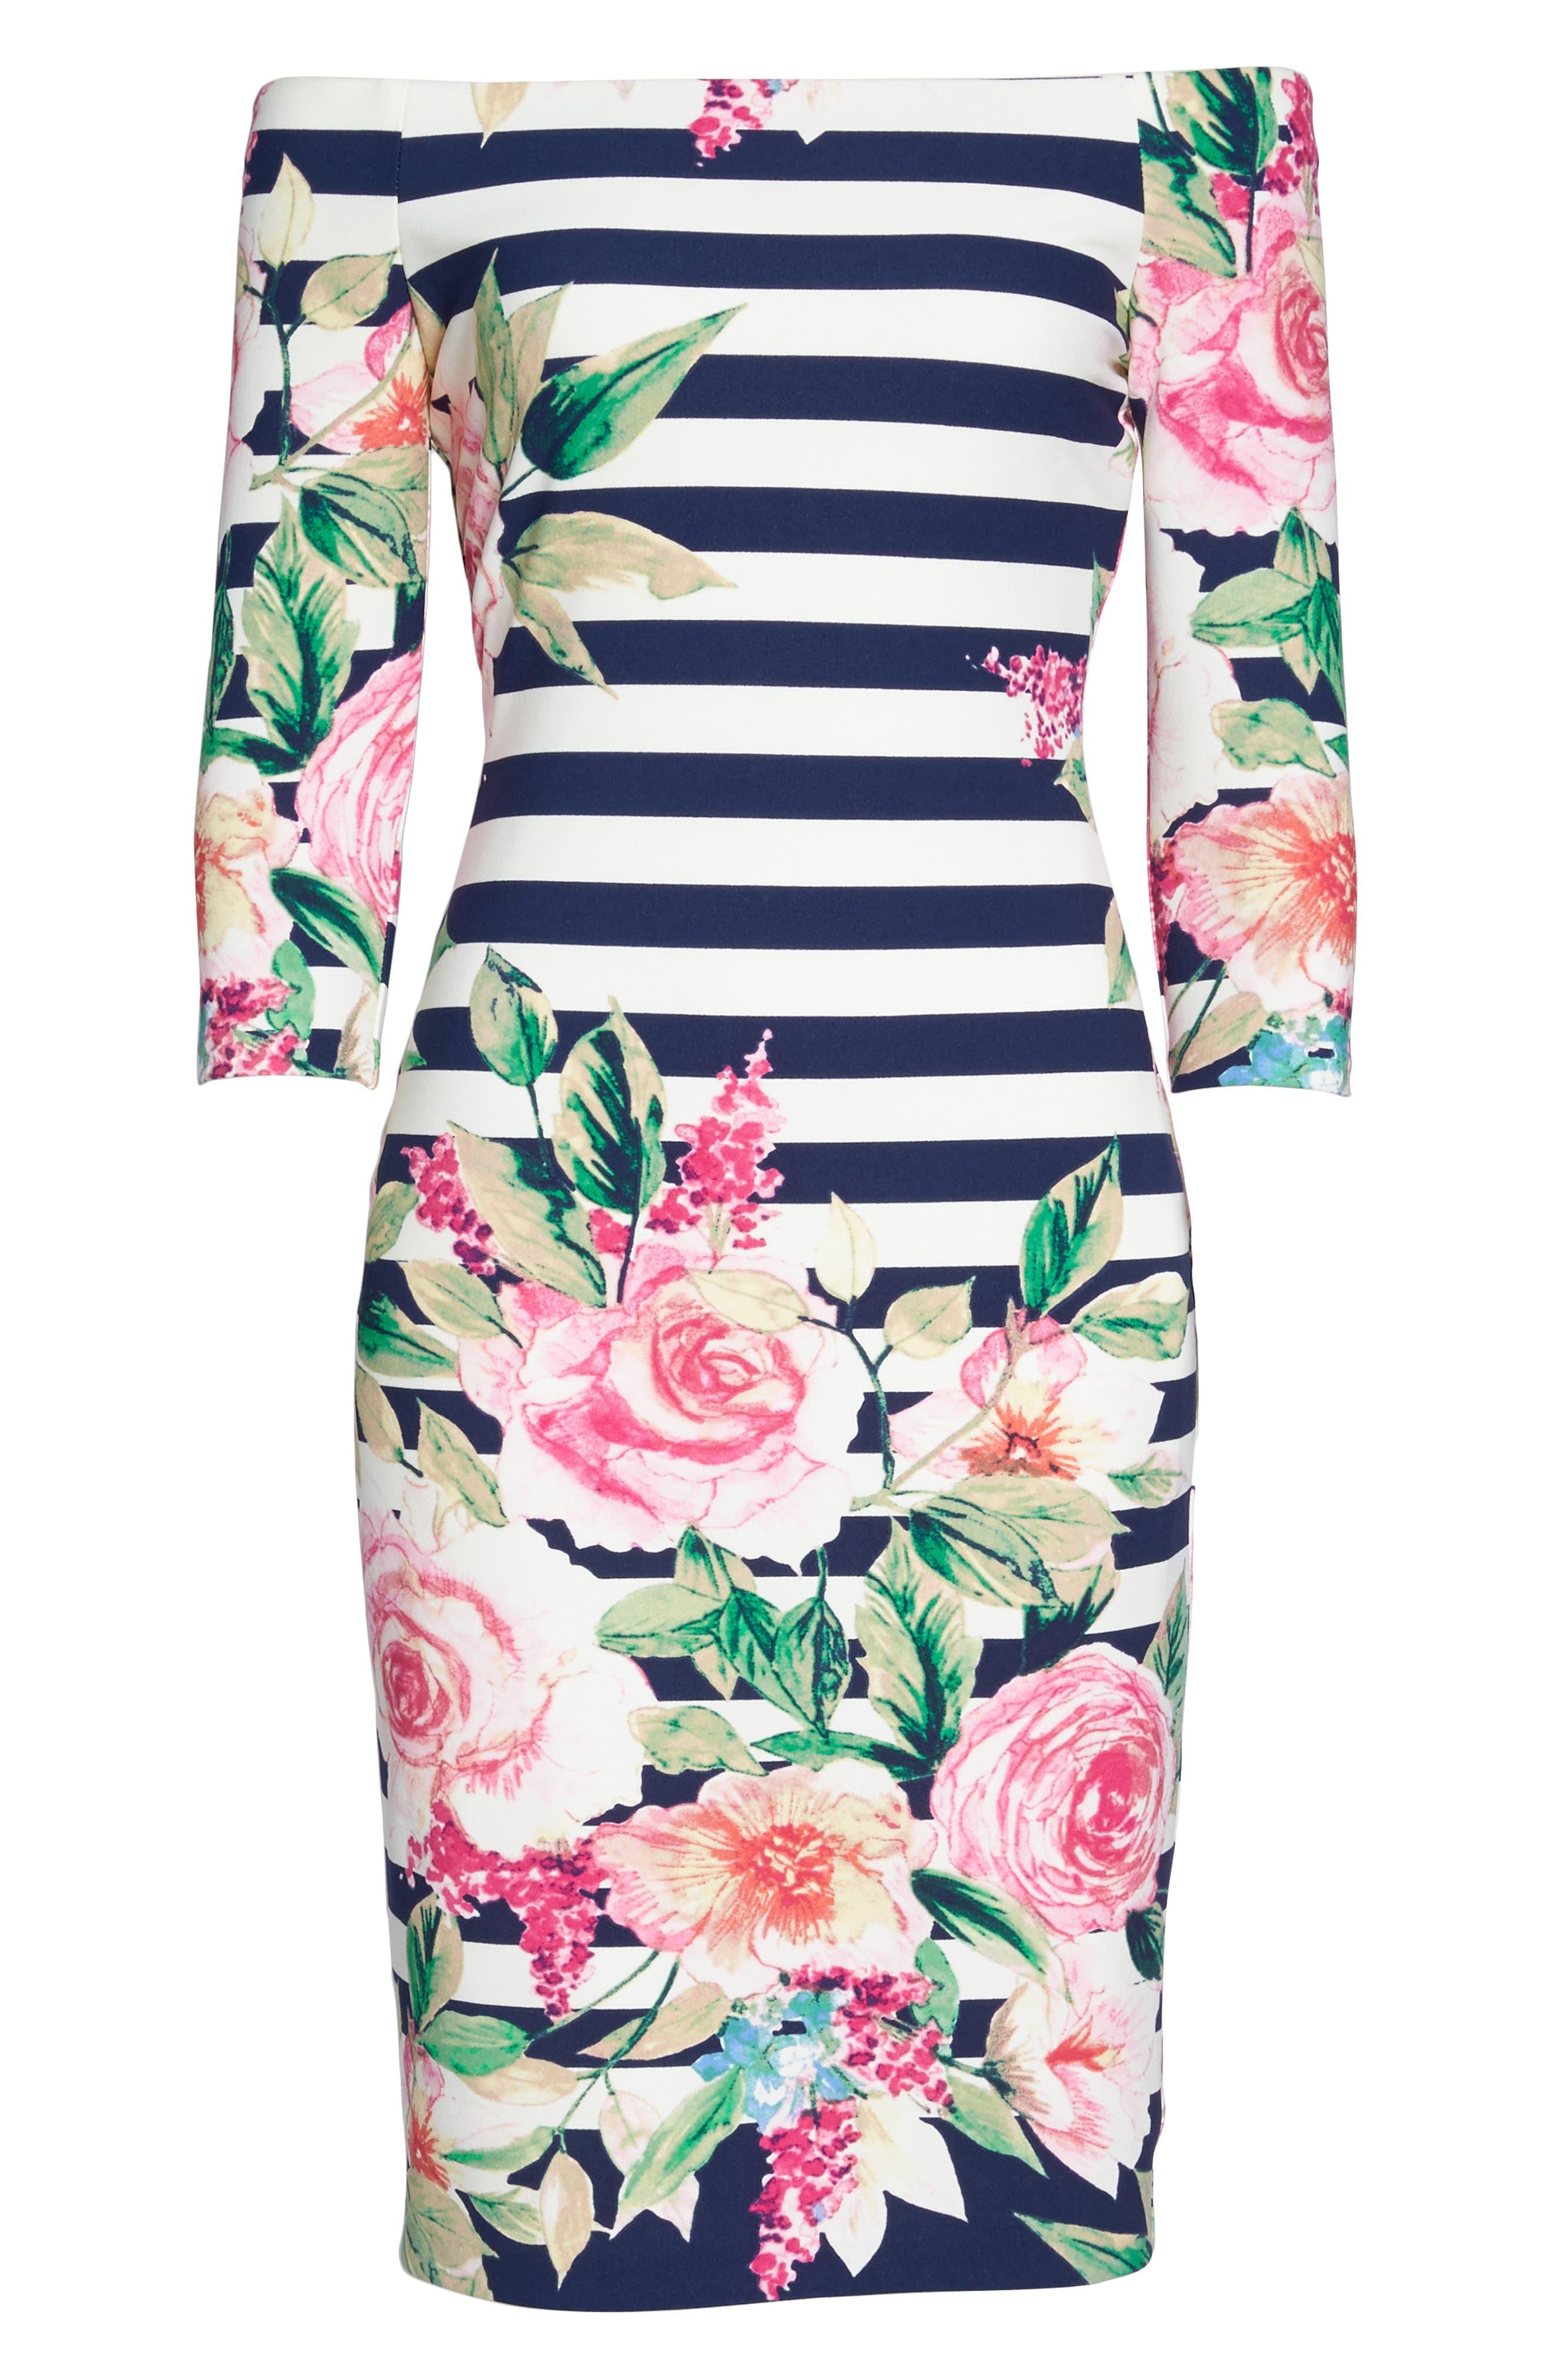 Stripe Off the Shoulder Dress,                             Alternate thumbnail 6, color,                             Navy